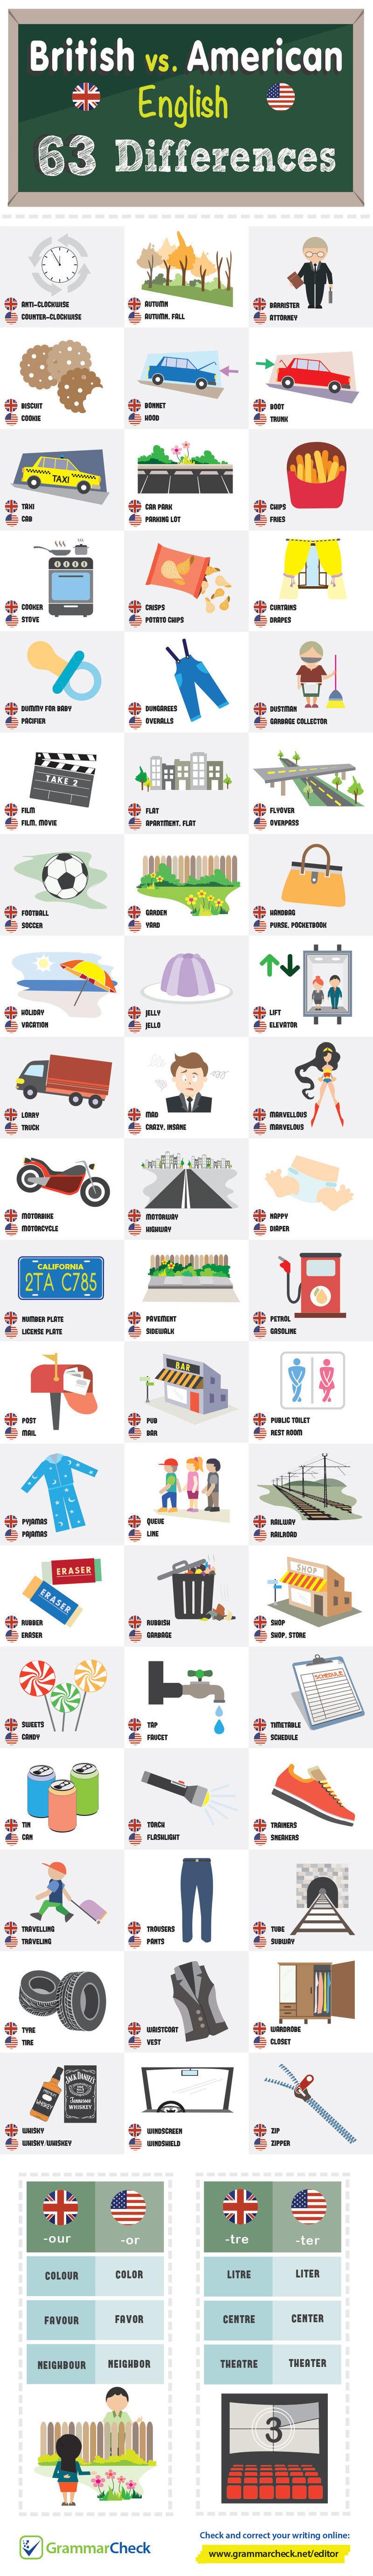 British Vs American English 63 Differences Writers Write British Vs American British And American English British English How to read british time